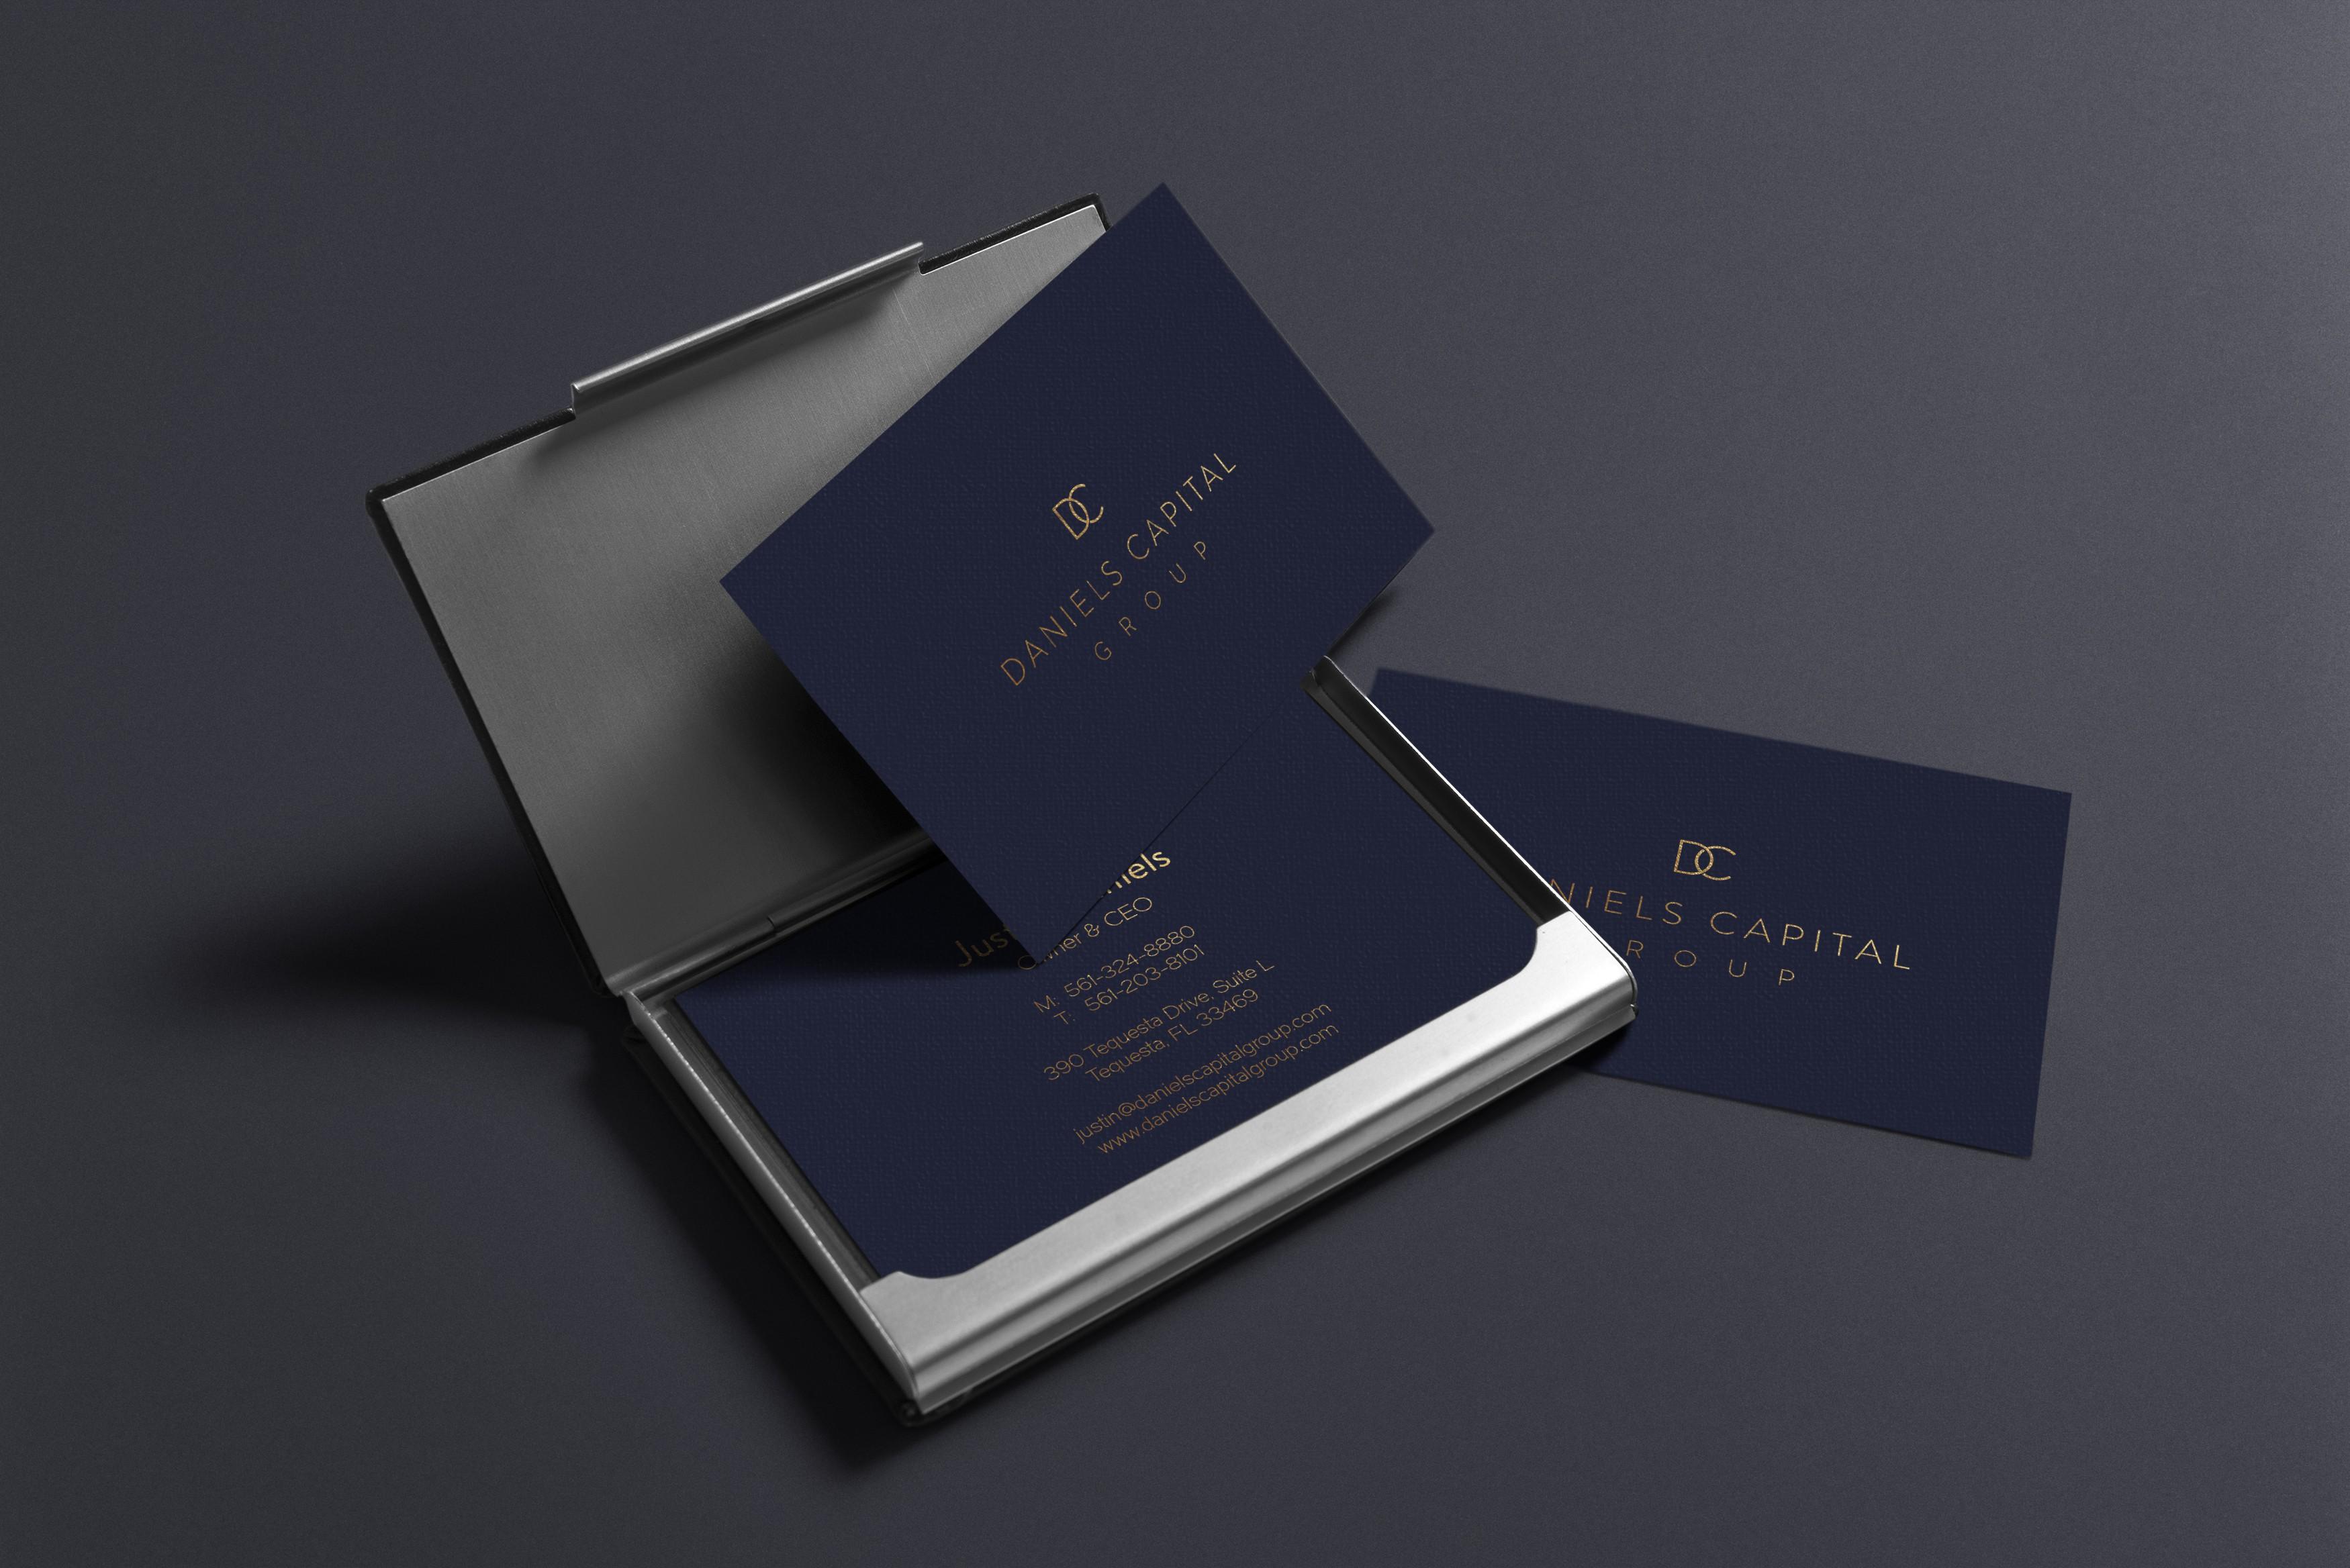 Daniels Capital Group - Logo & Stationery design